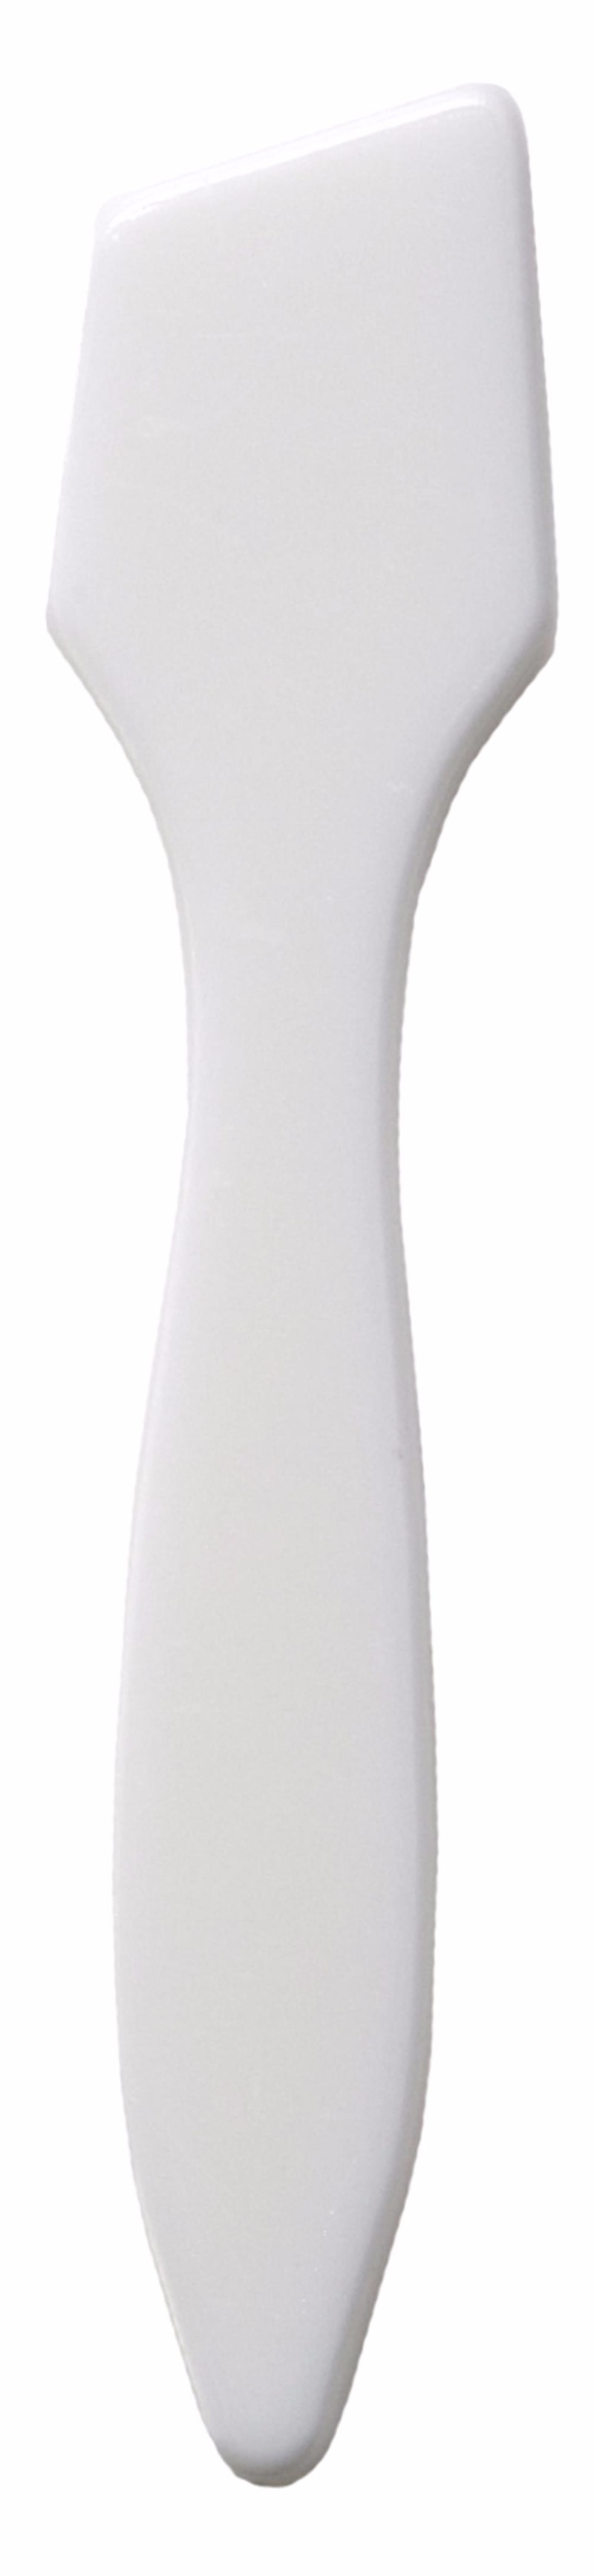 Ansiktspenselset Snazaroo Special FX wax tool